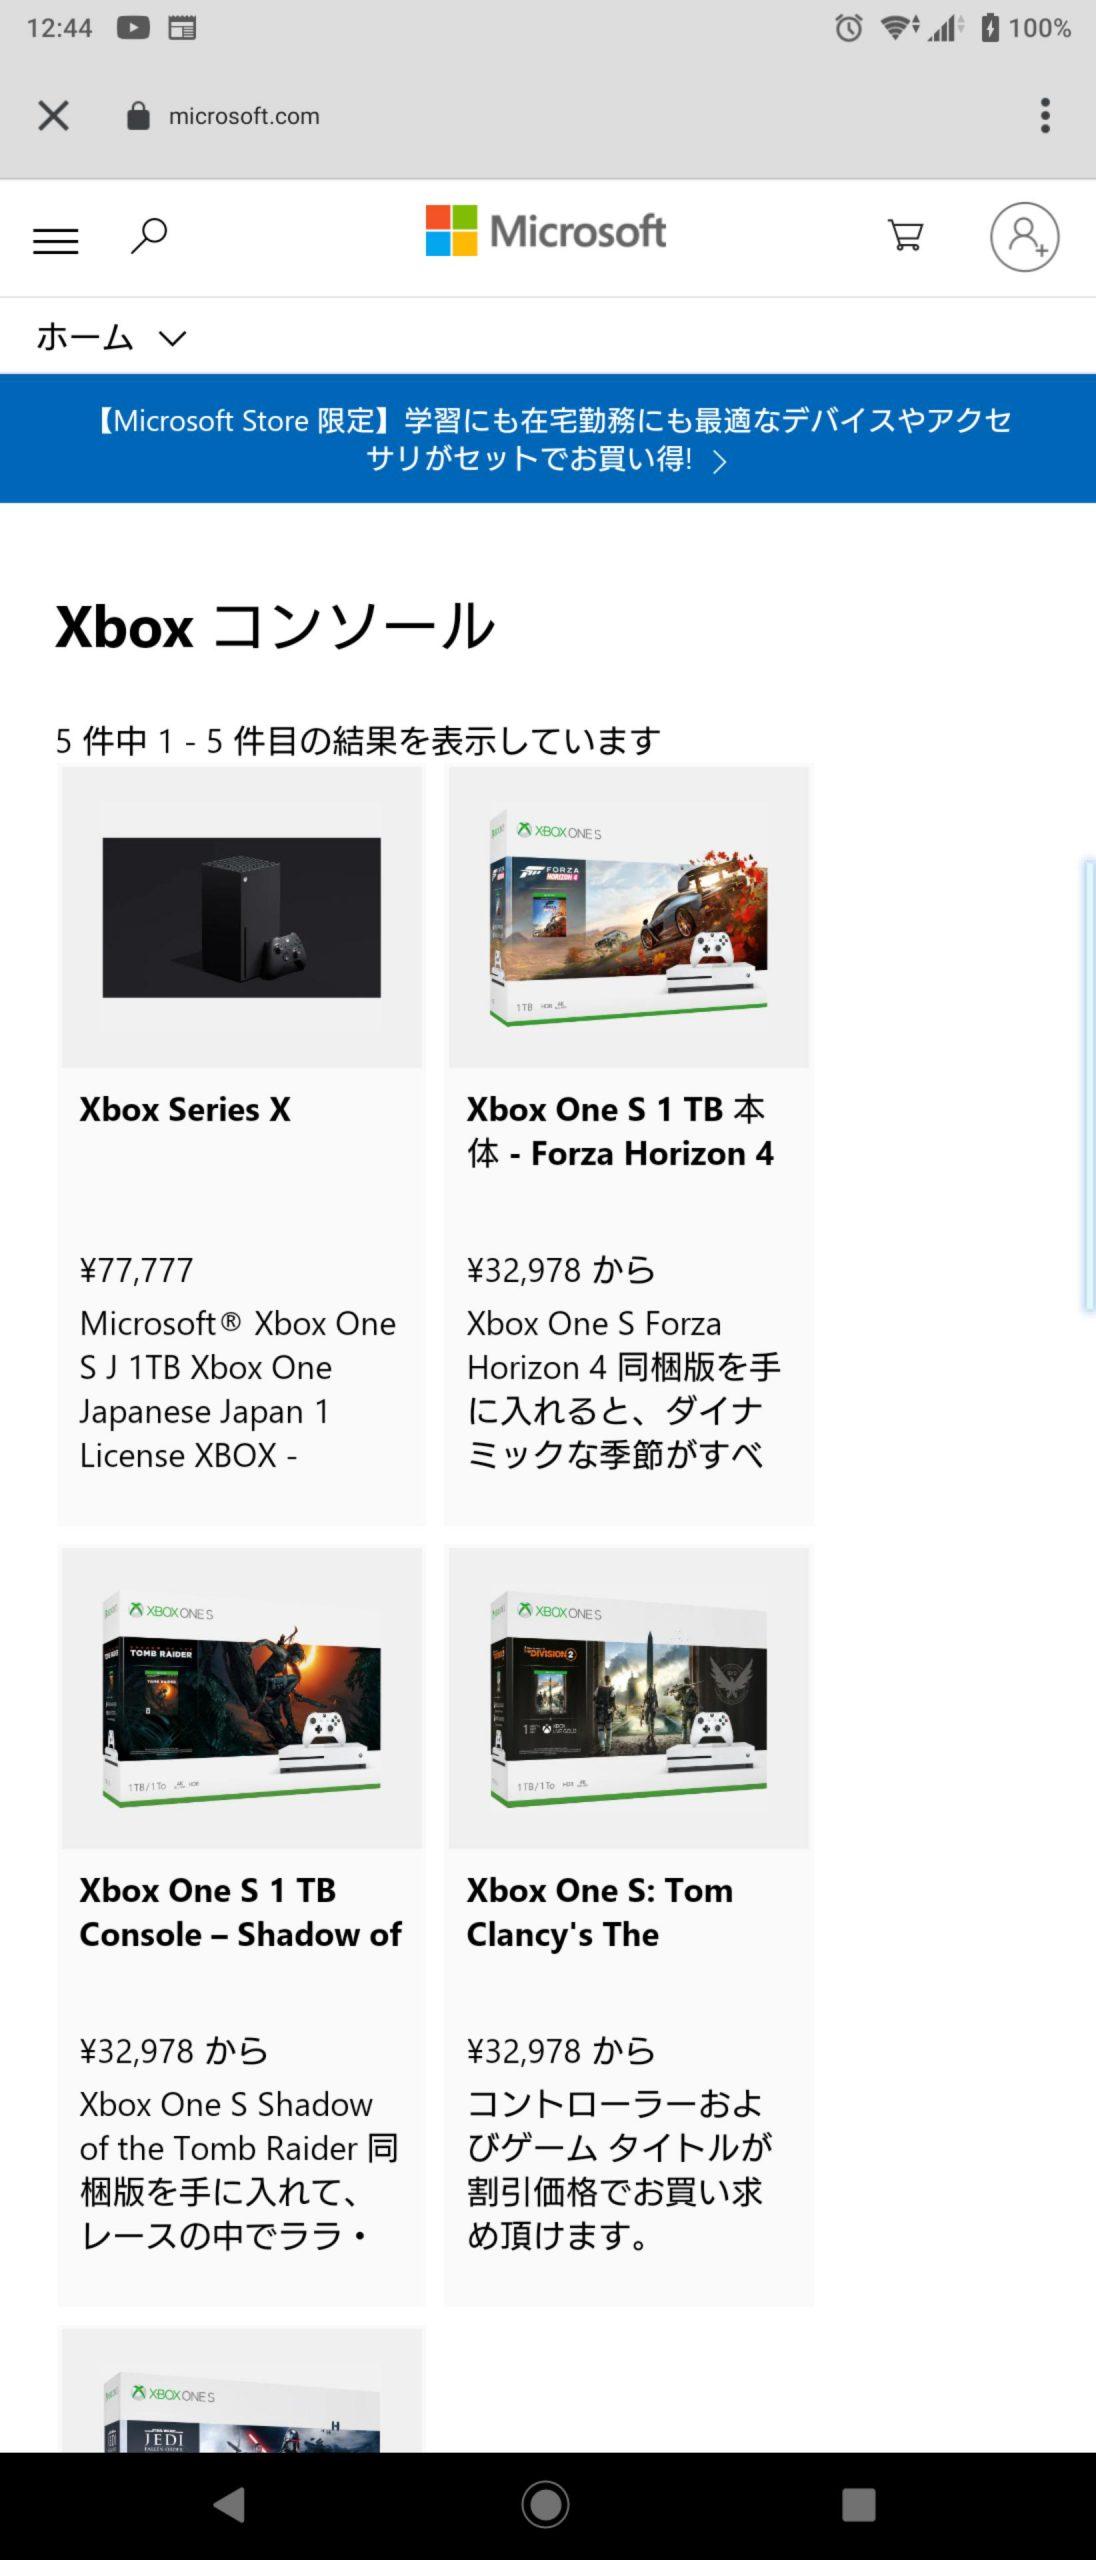 gBeYCUa scaled - 【公式より】Xbox Series X、77,777円に決まる